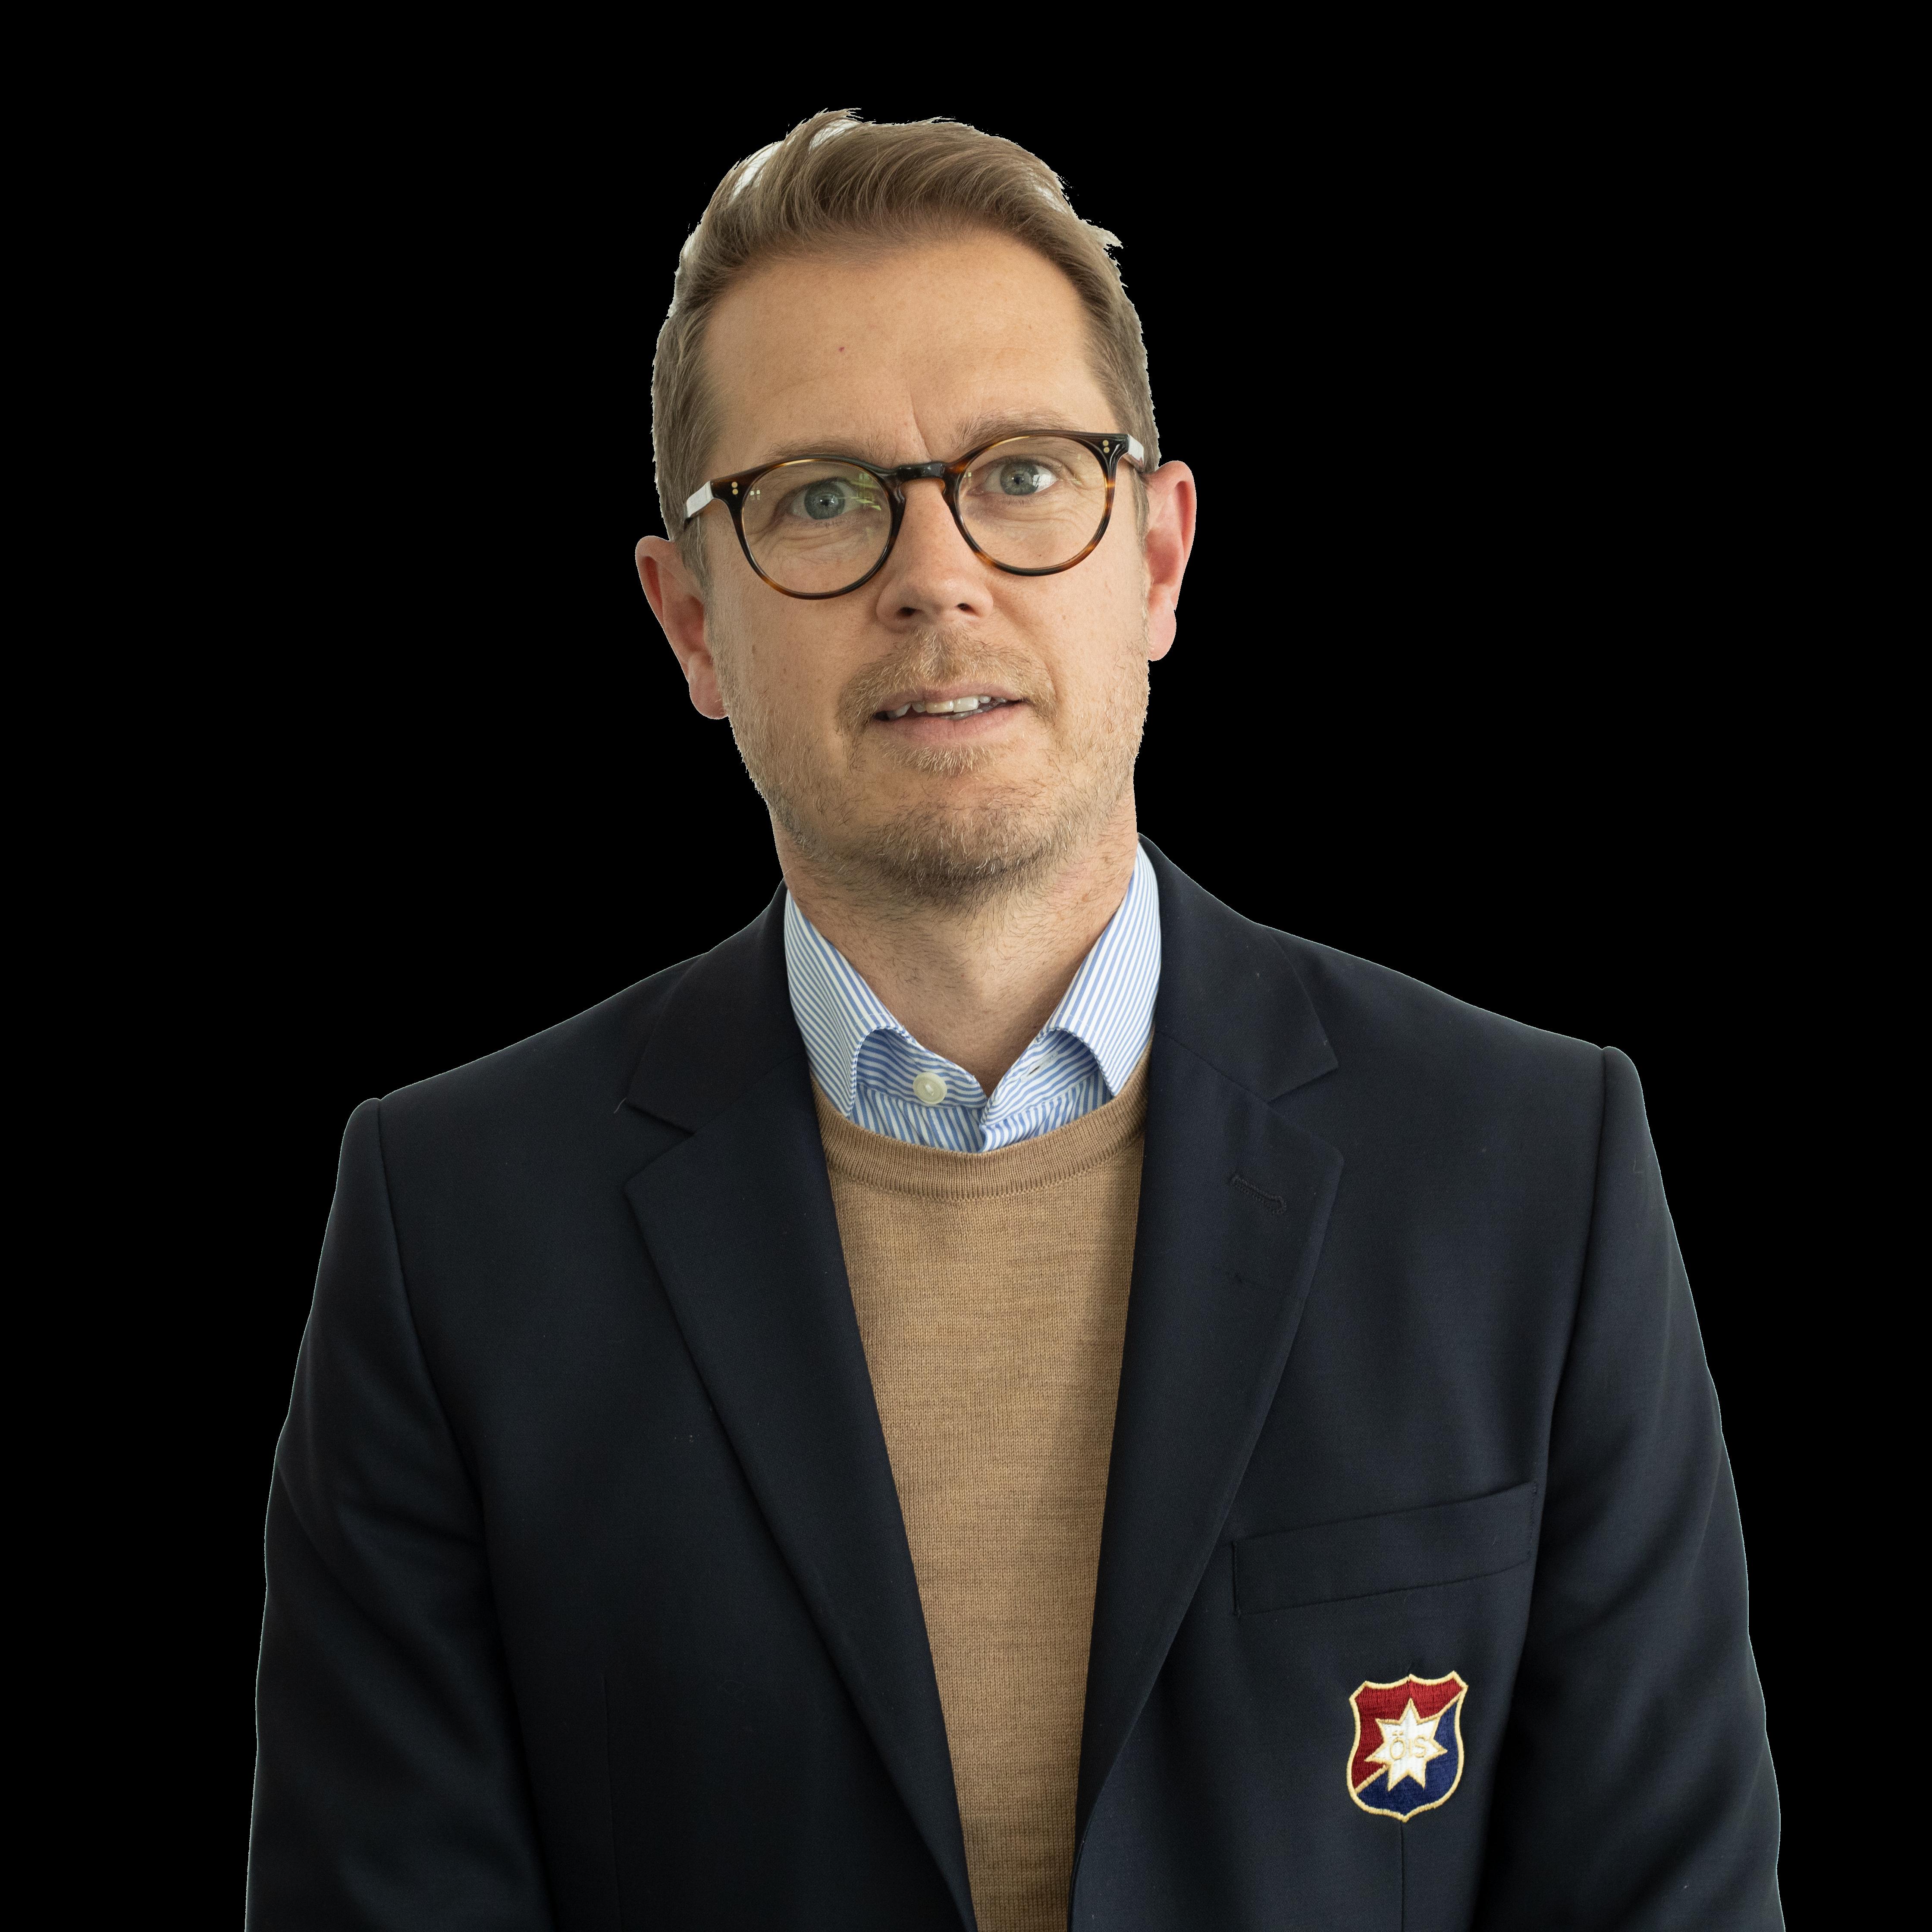 Per Skånberg